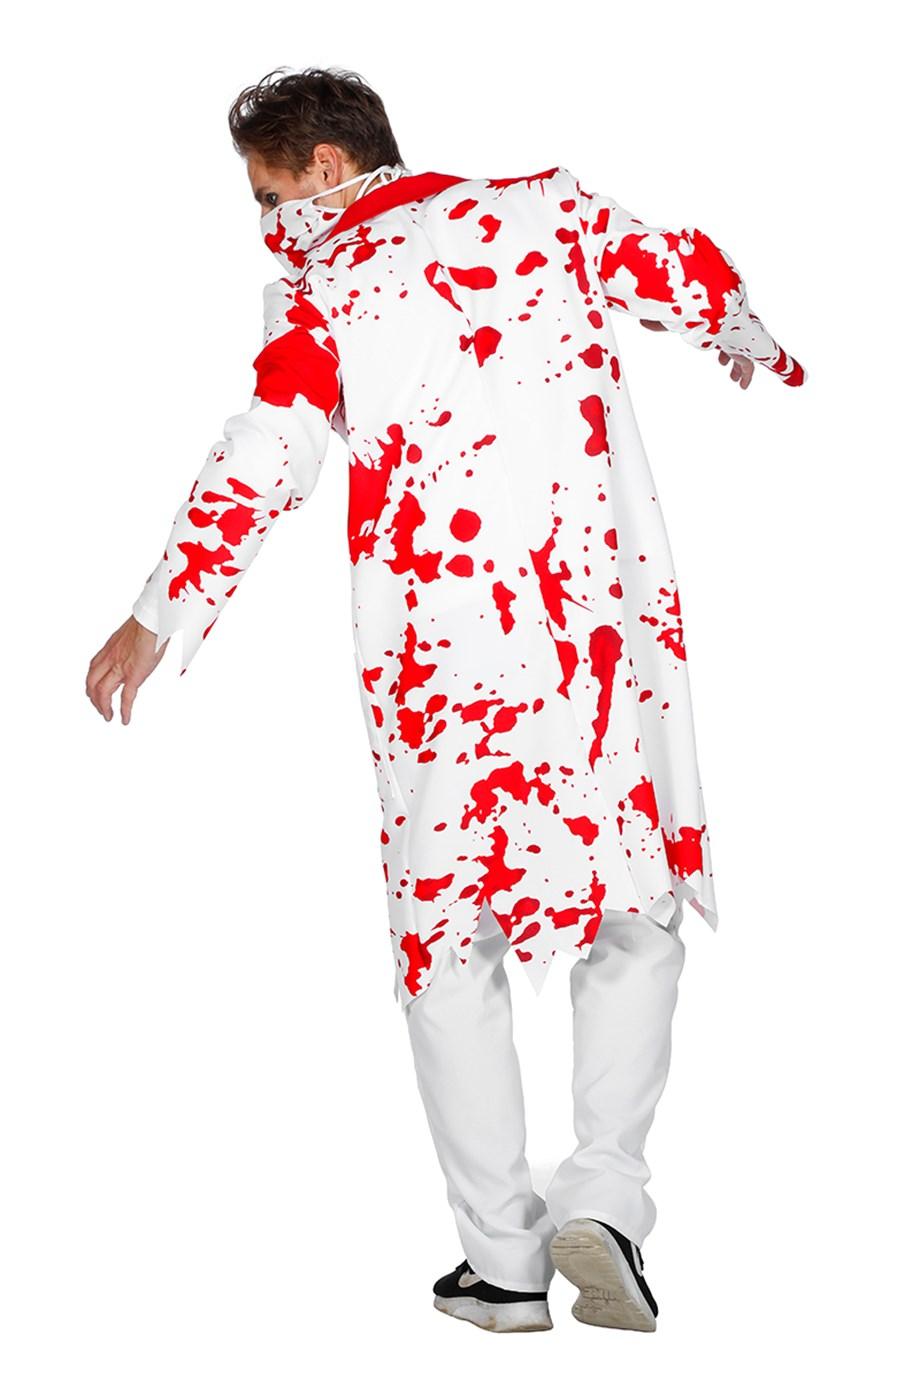 Zombiedokter-258925